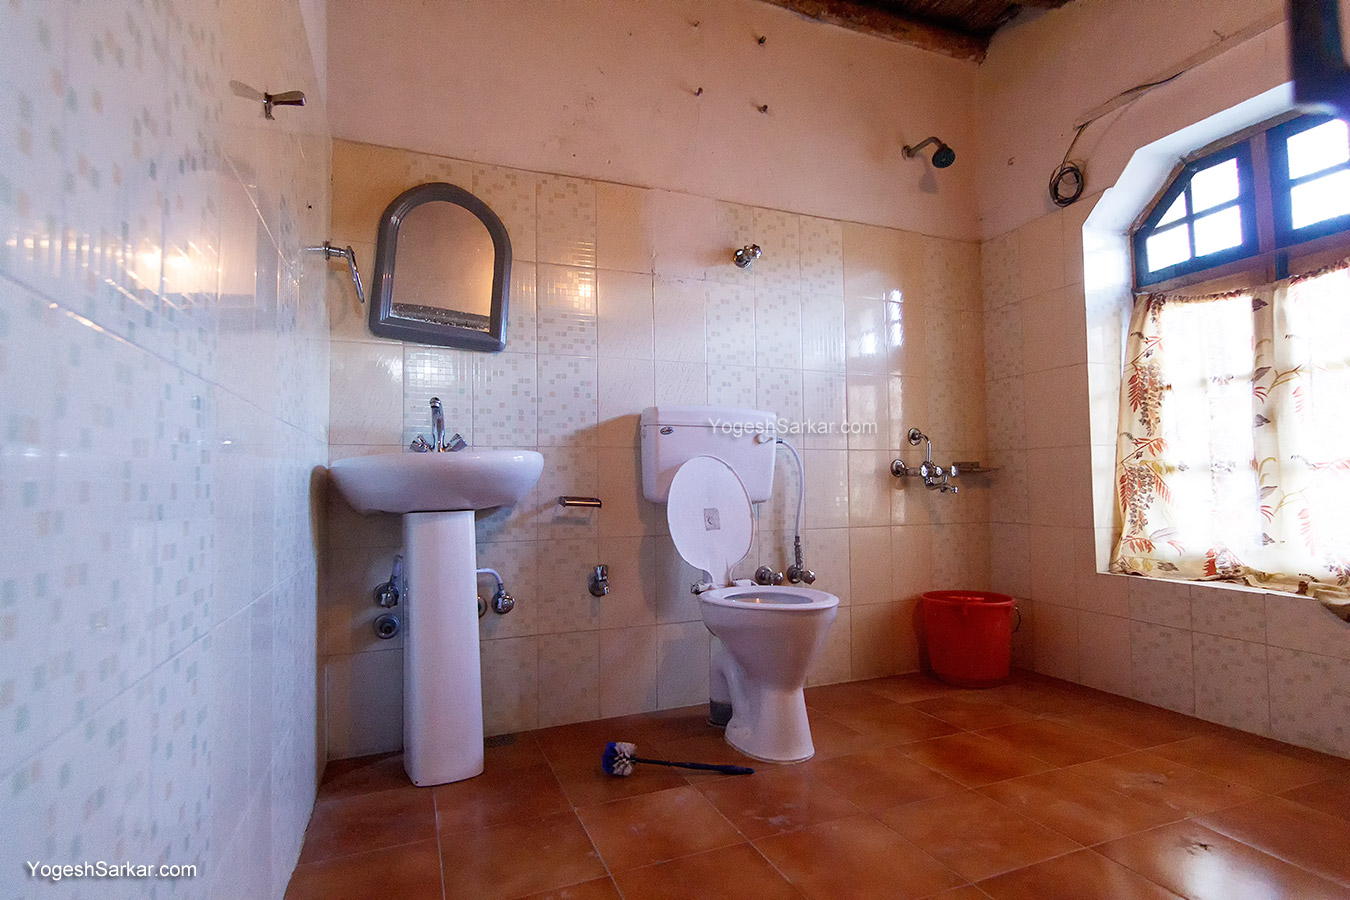 habib-guest-house-bathroom.jpg